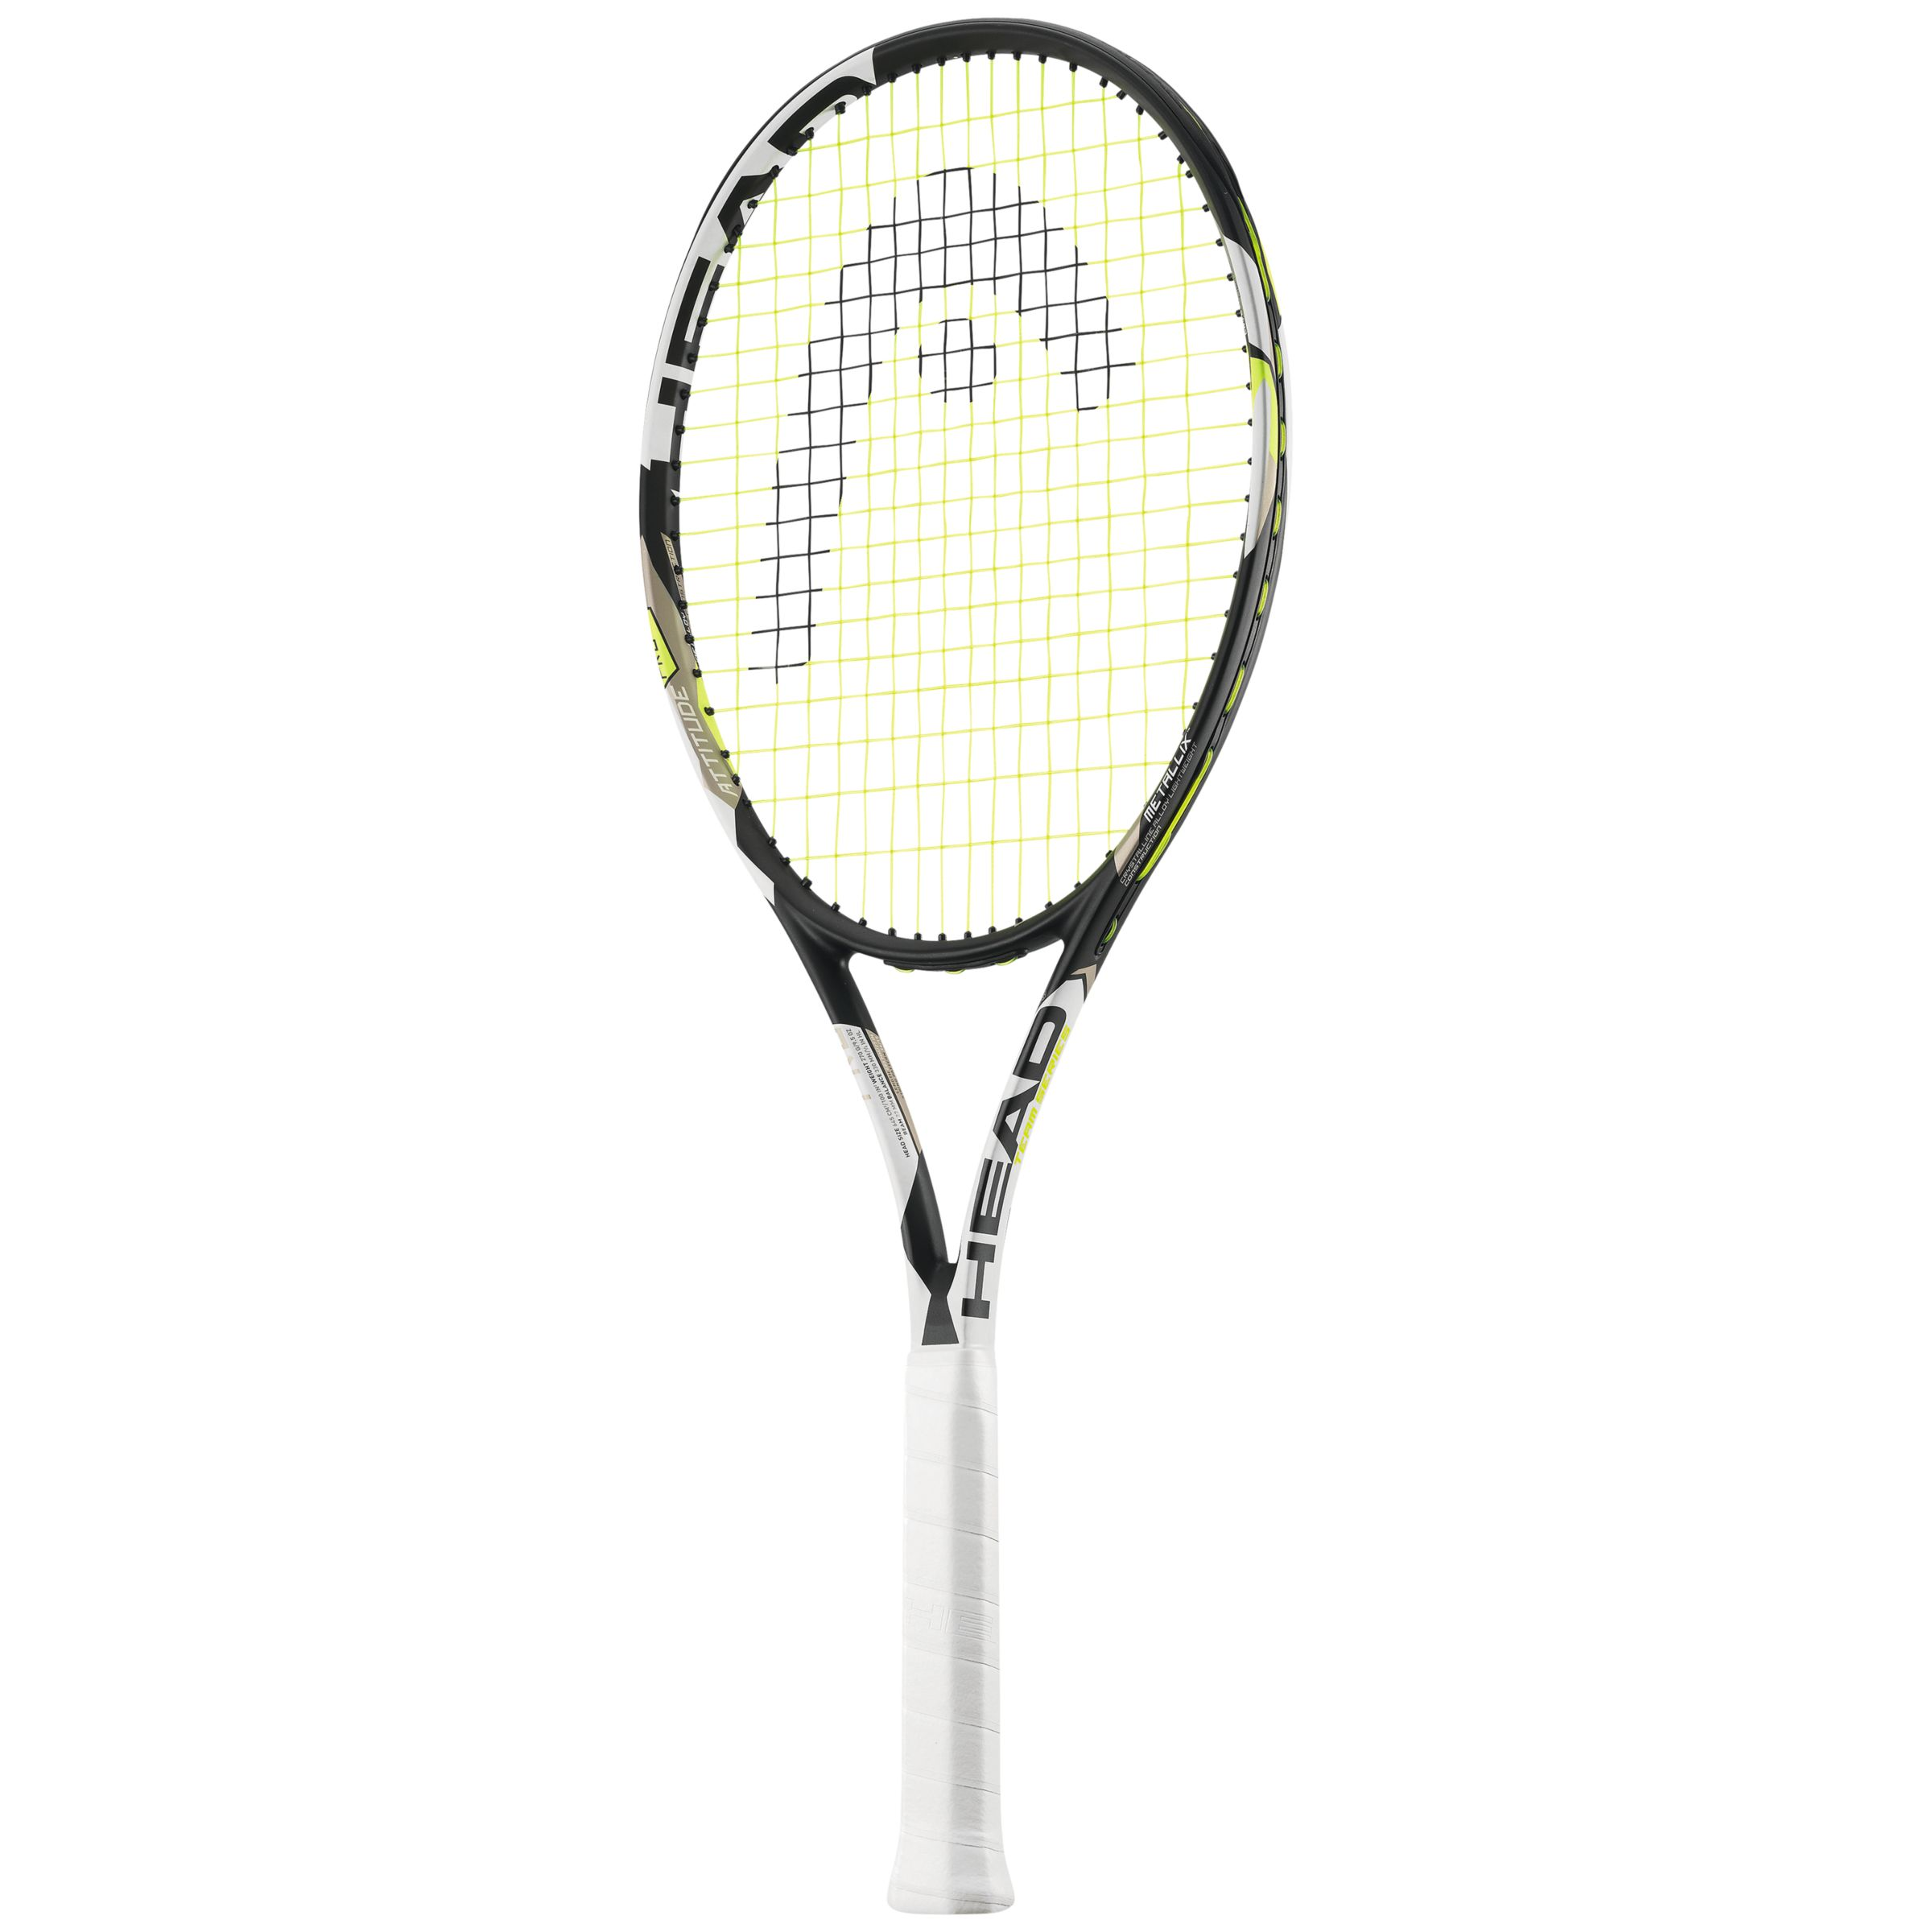 Head Head Attitude Pro Adult Tennis Racket, Black, L3